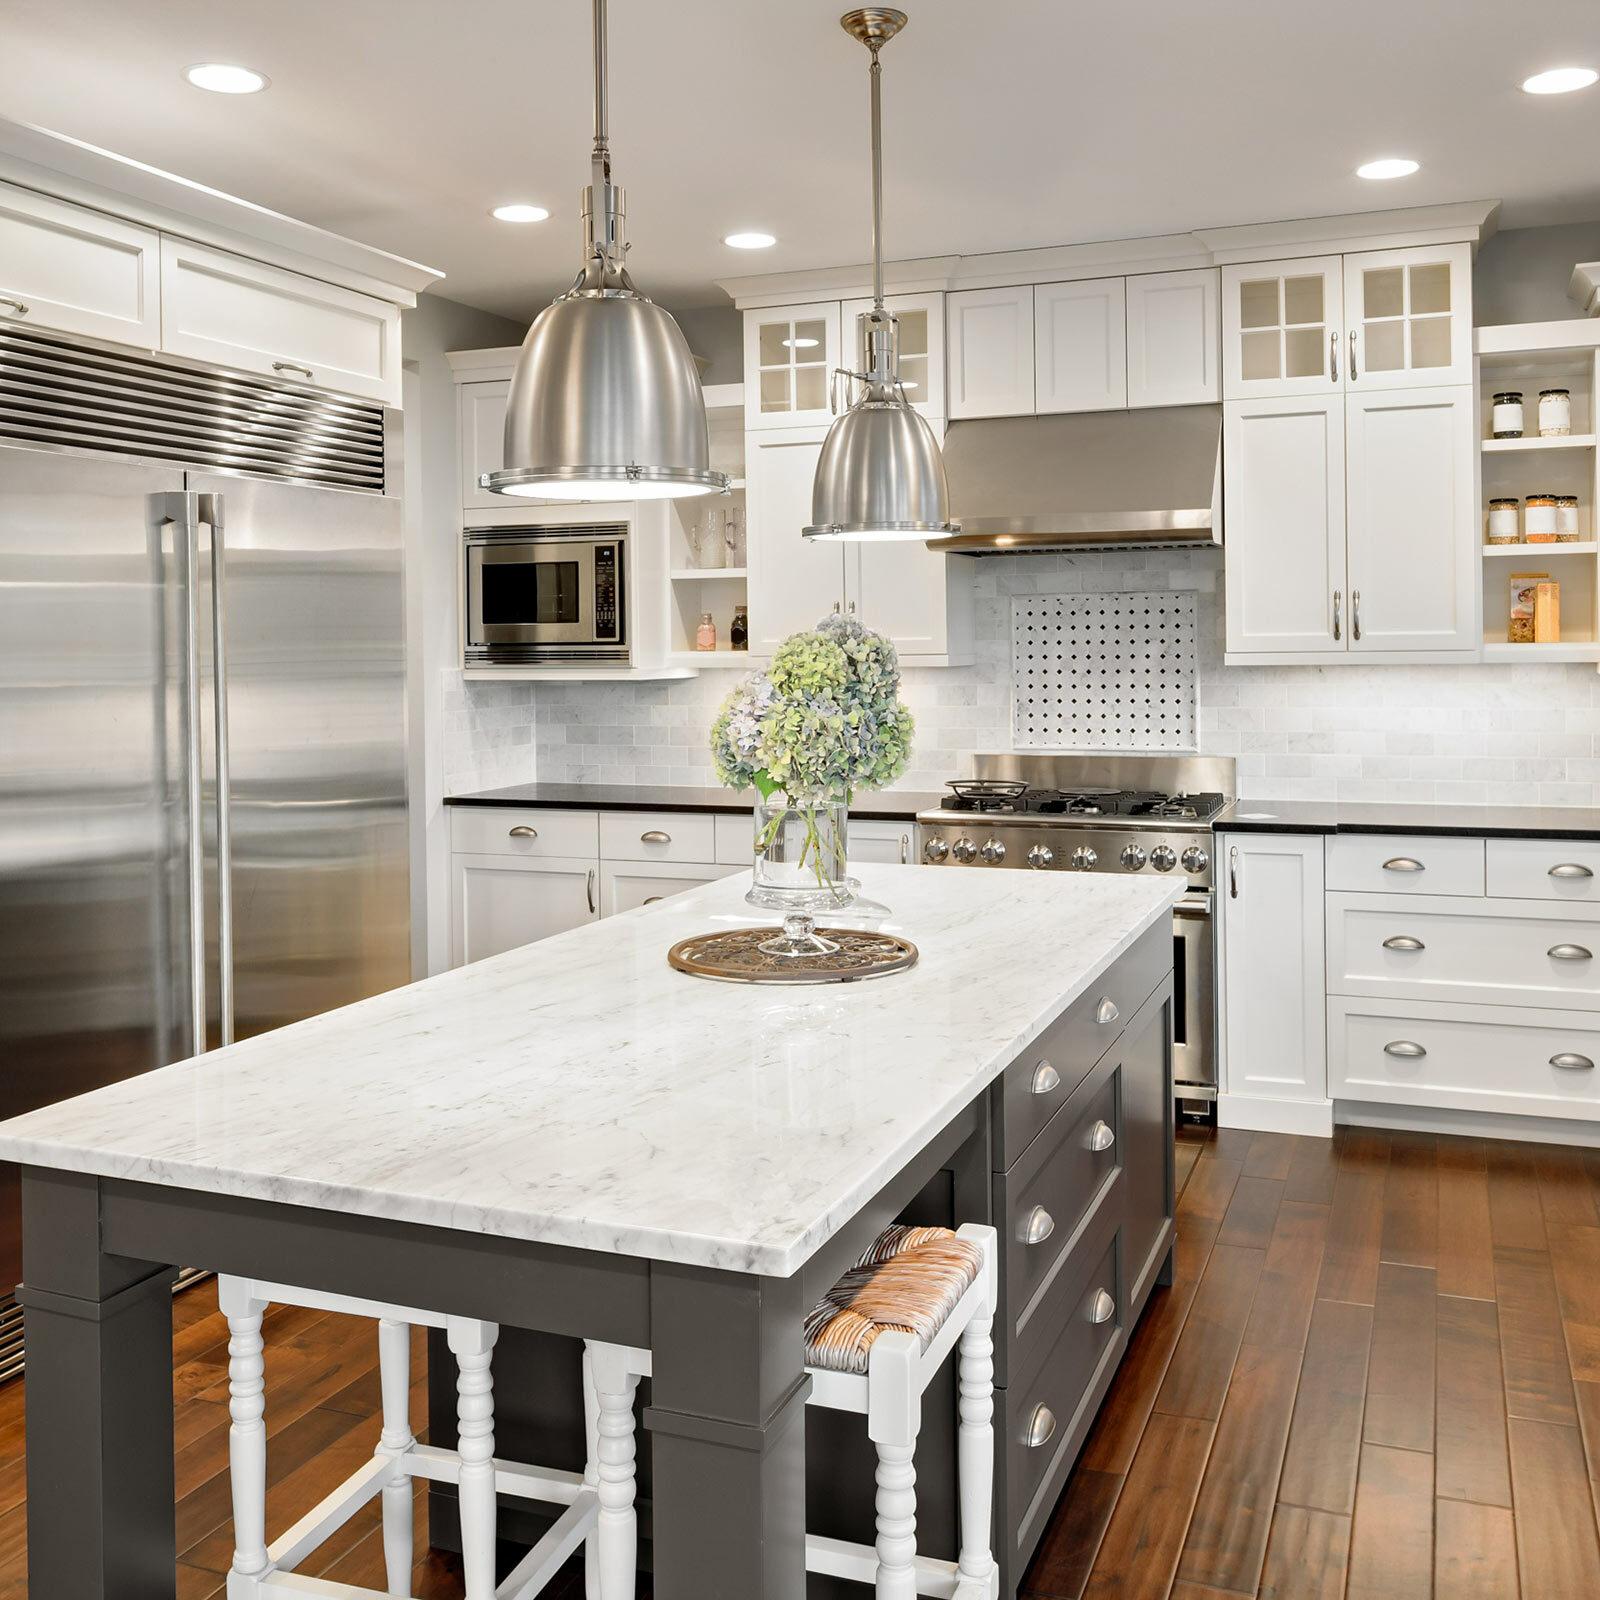 Wood looks kitchen | Great Lakes Carpet & Tile